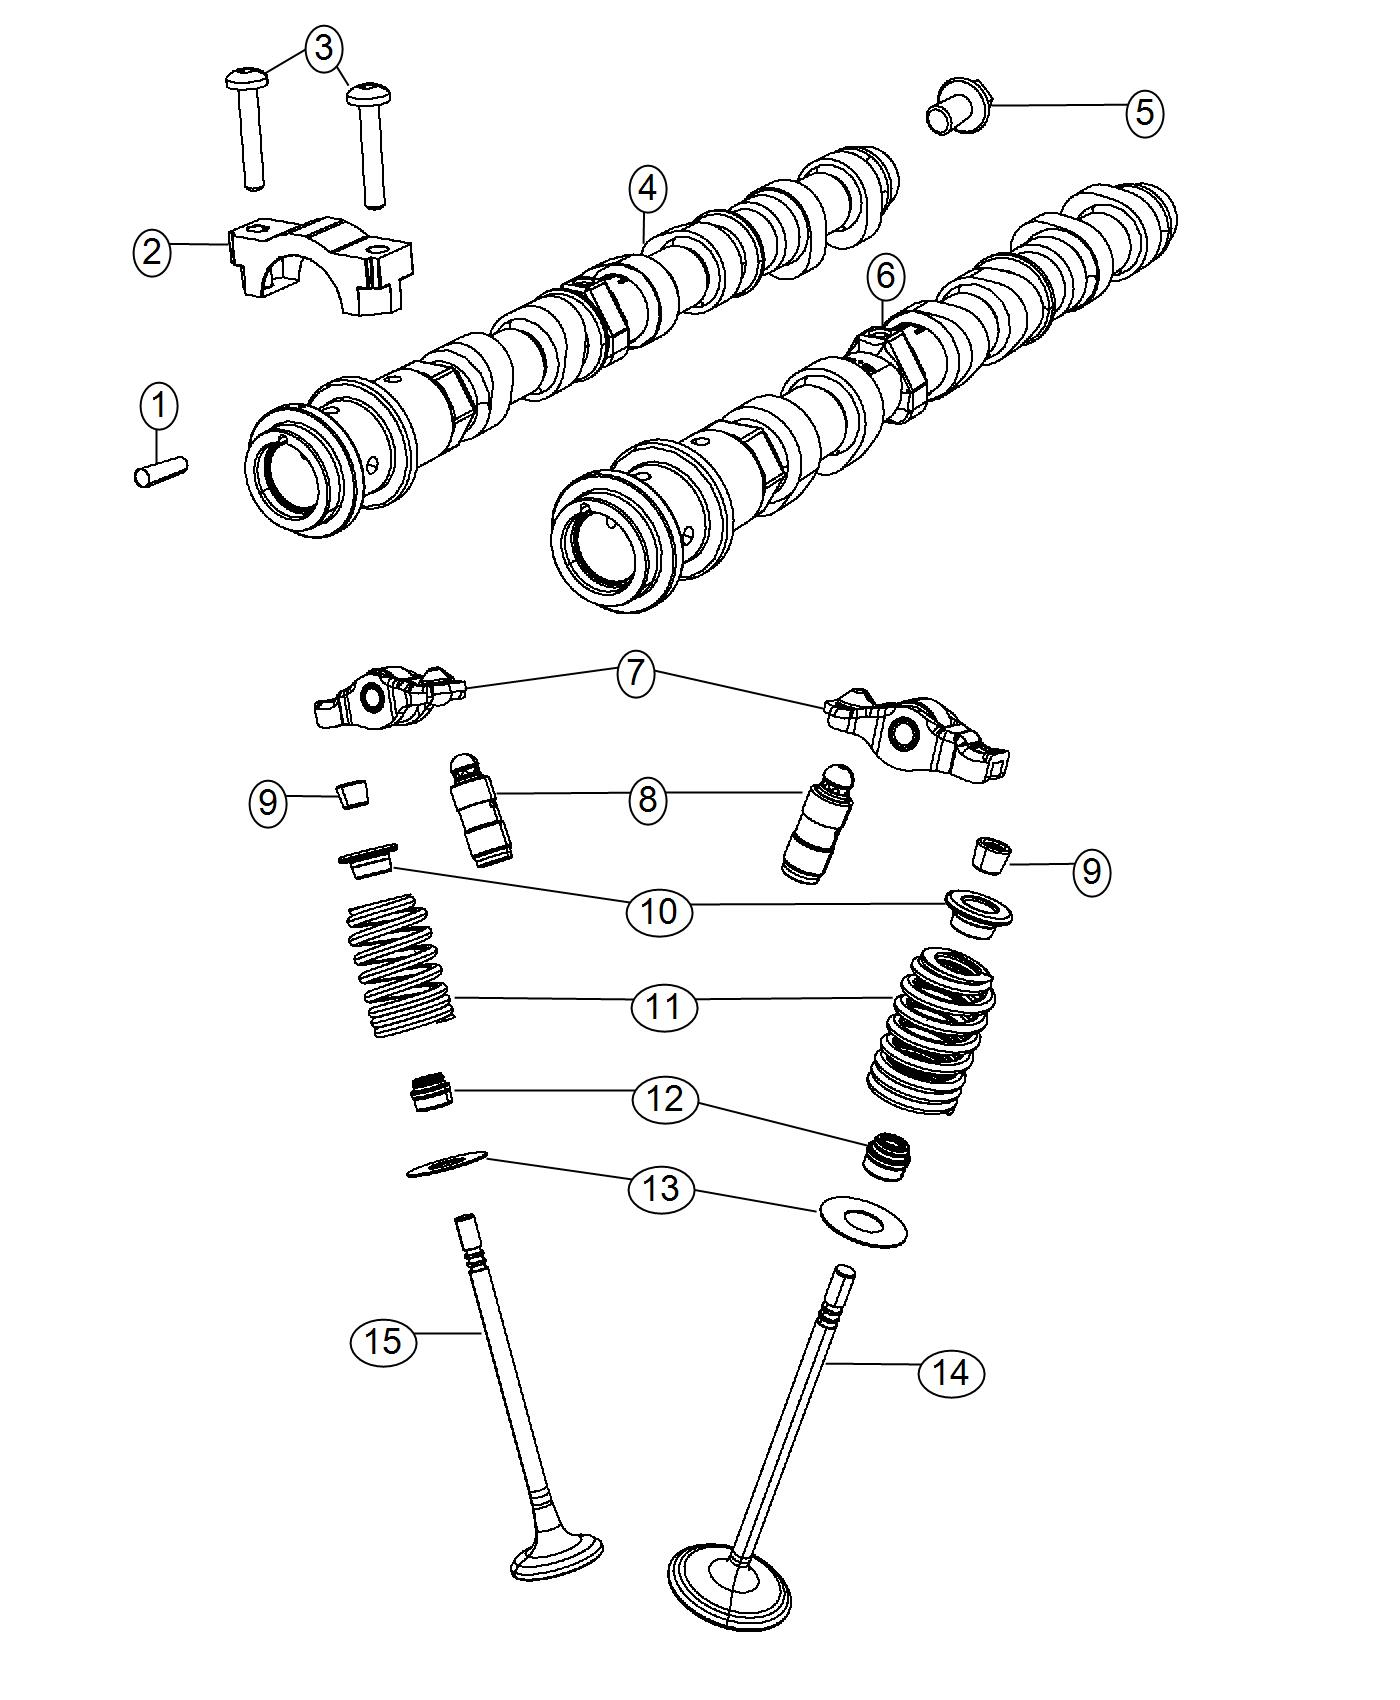 tags: #2005 chevy trailblazer engine diagram#2004 gmc envoy parts diagram#2004  trailblazer engine diagram#2004 trailblazer parts diagram#2003 chevy